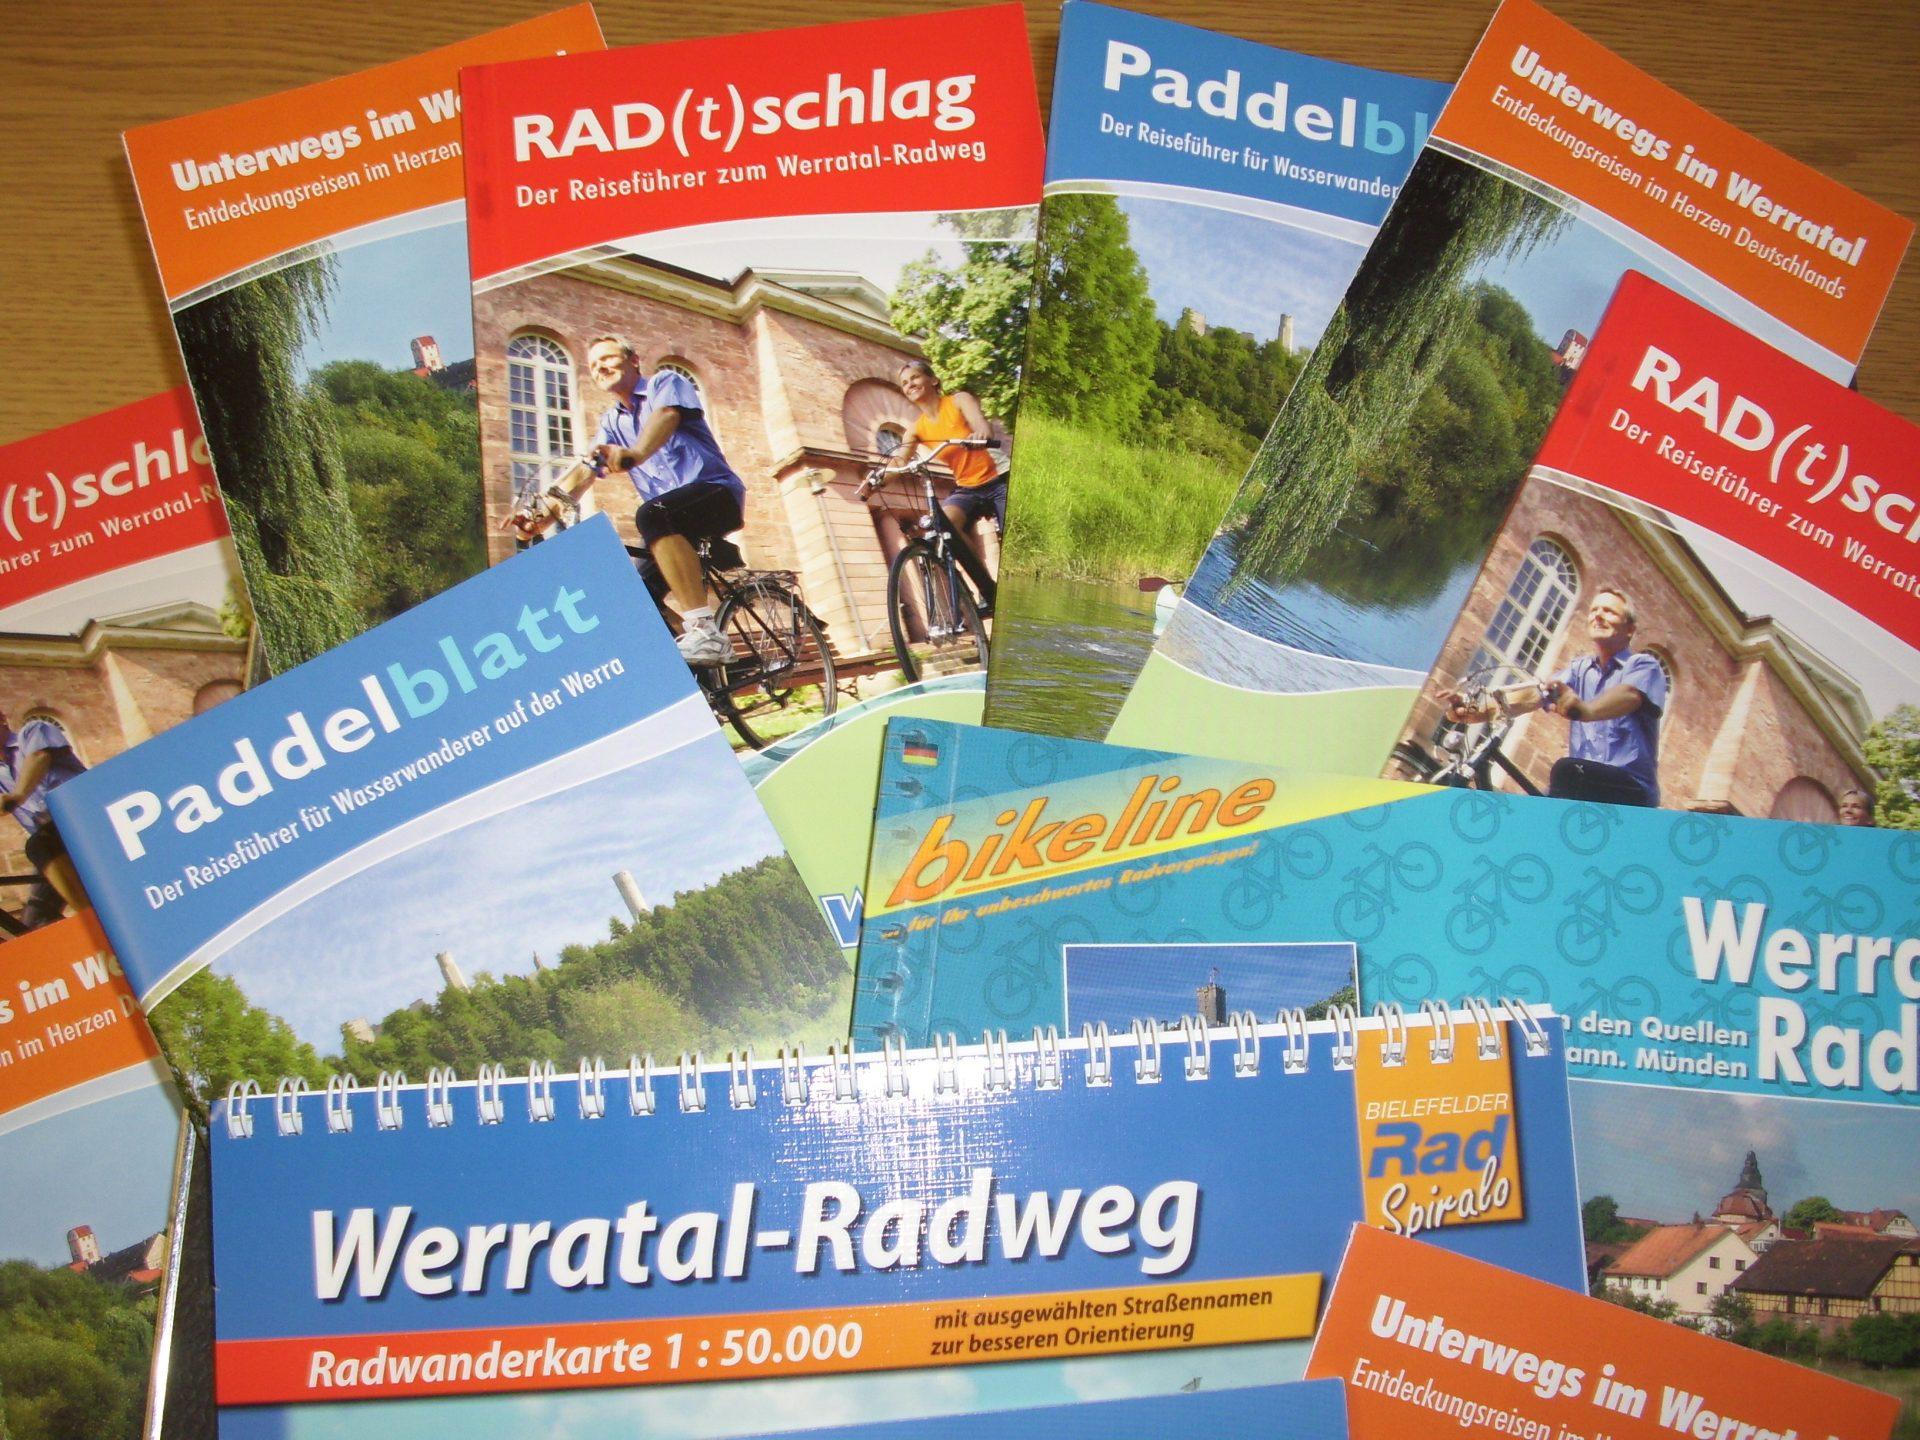 nfomaterial, Werbemittel Flyer, Broschüren: Rad(t)schlag, Paddelblatt, Radwanderkarten hier bestellen